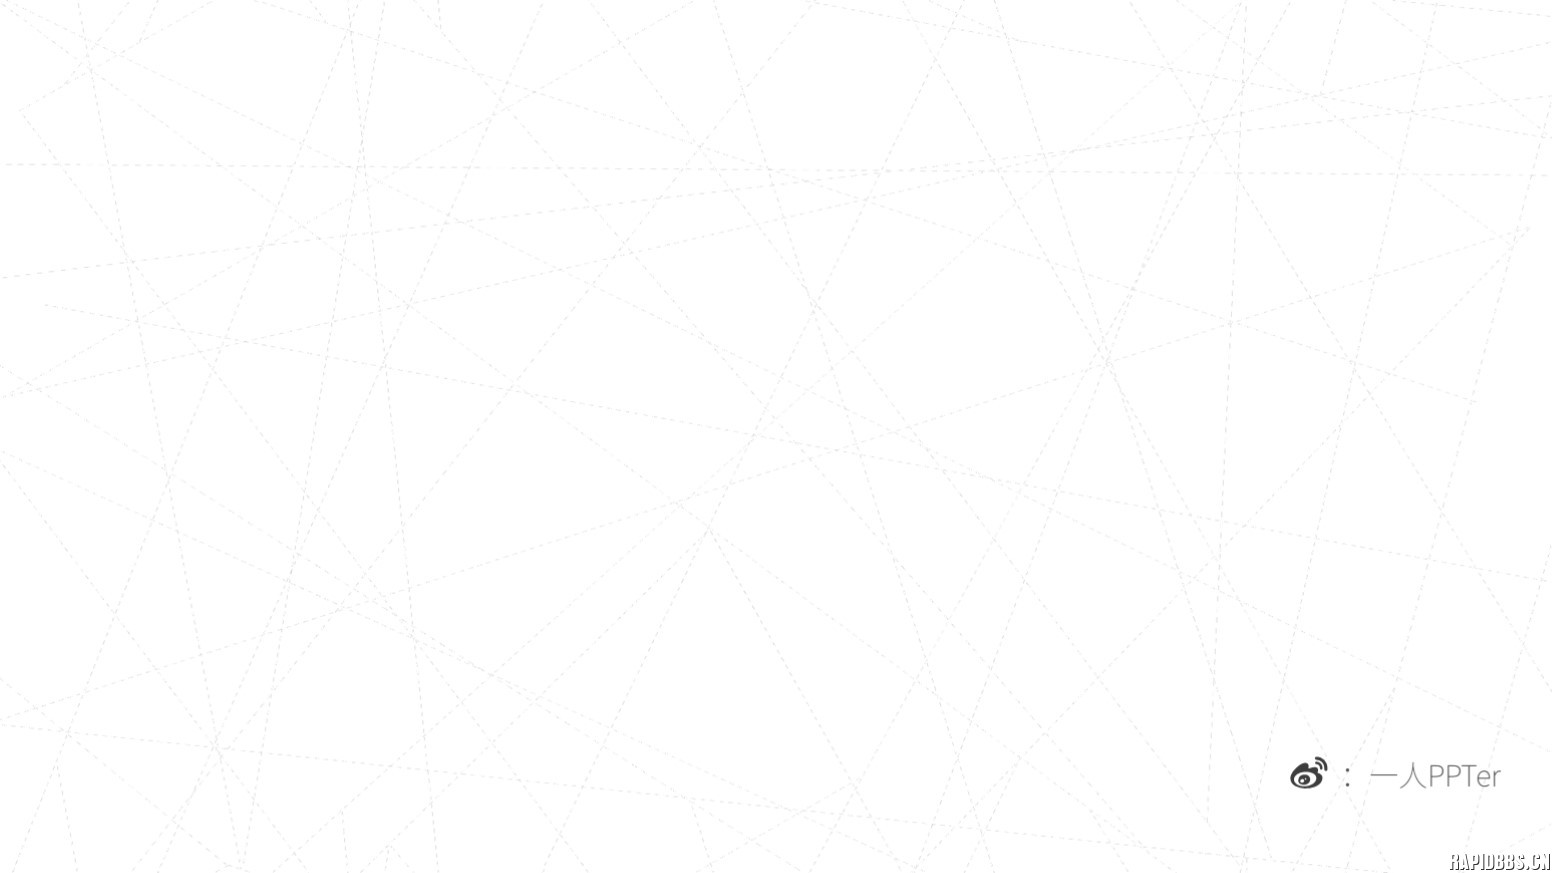 ppt素材分享之八种实用浅色背景【网格,纸纹,低平面,线条,皮质,斜线】